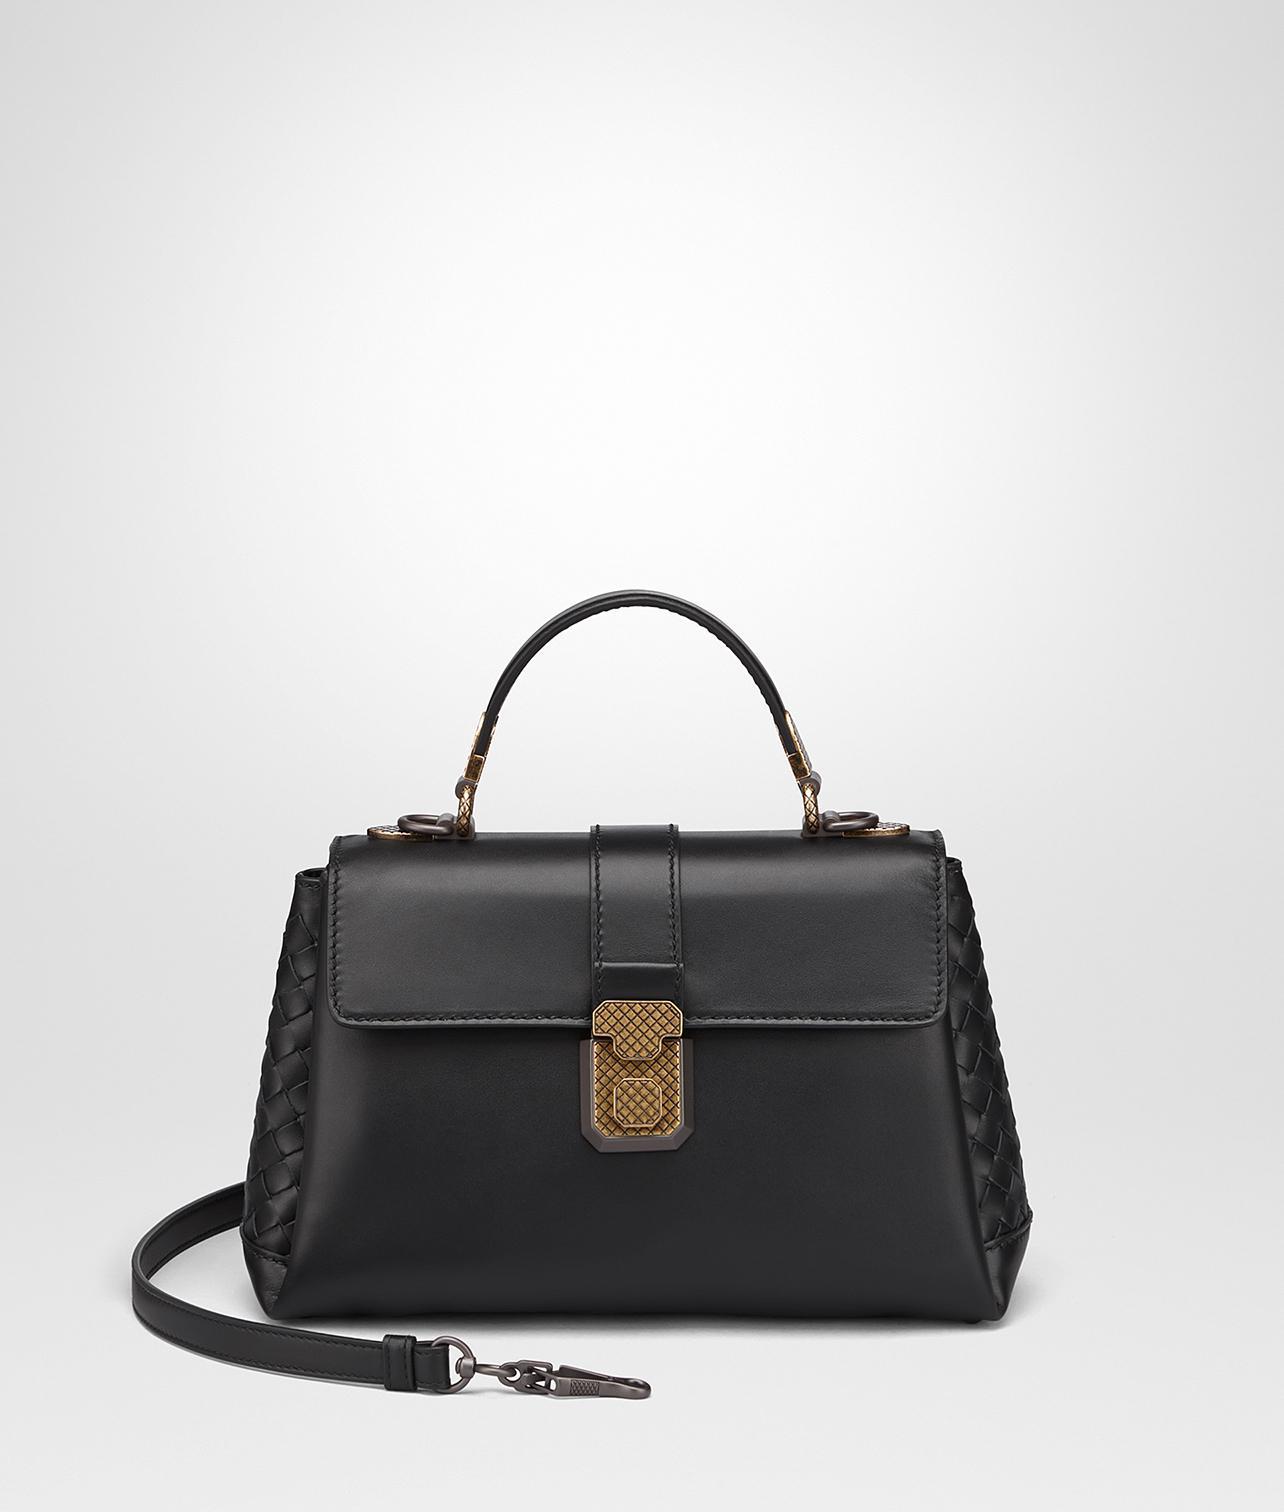 2b9d335252 Bottega Veneta Denim Calf Small Piazza Bag in Black - Lyst